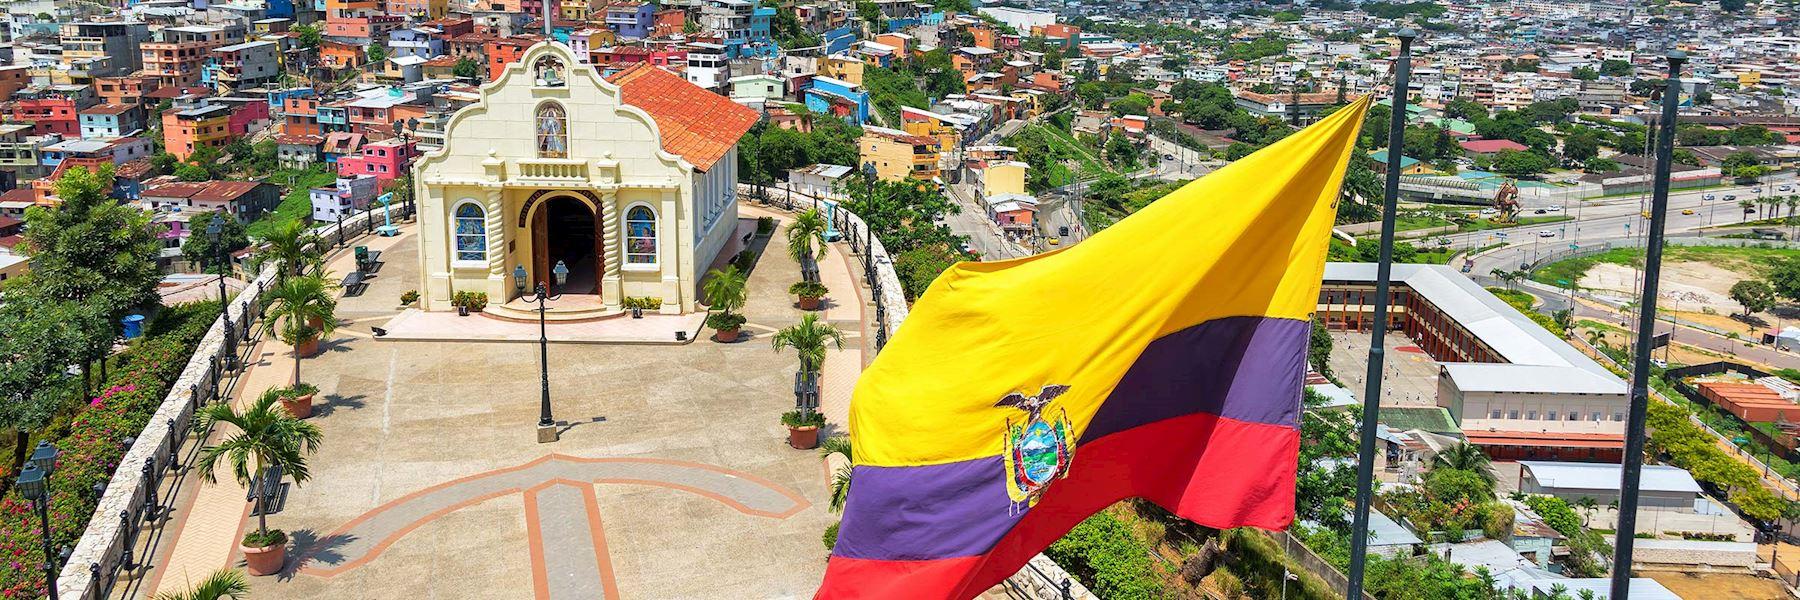 Visit Guayaquil, Ecuador